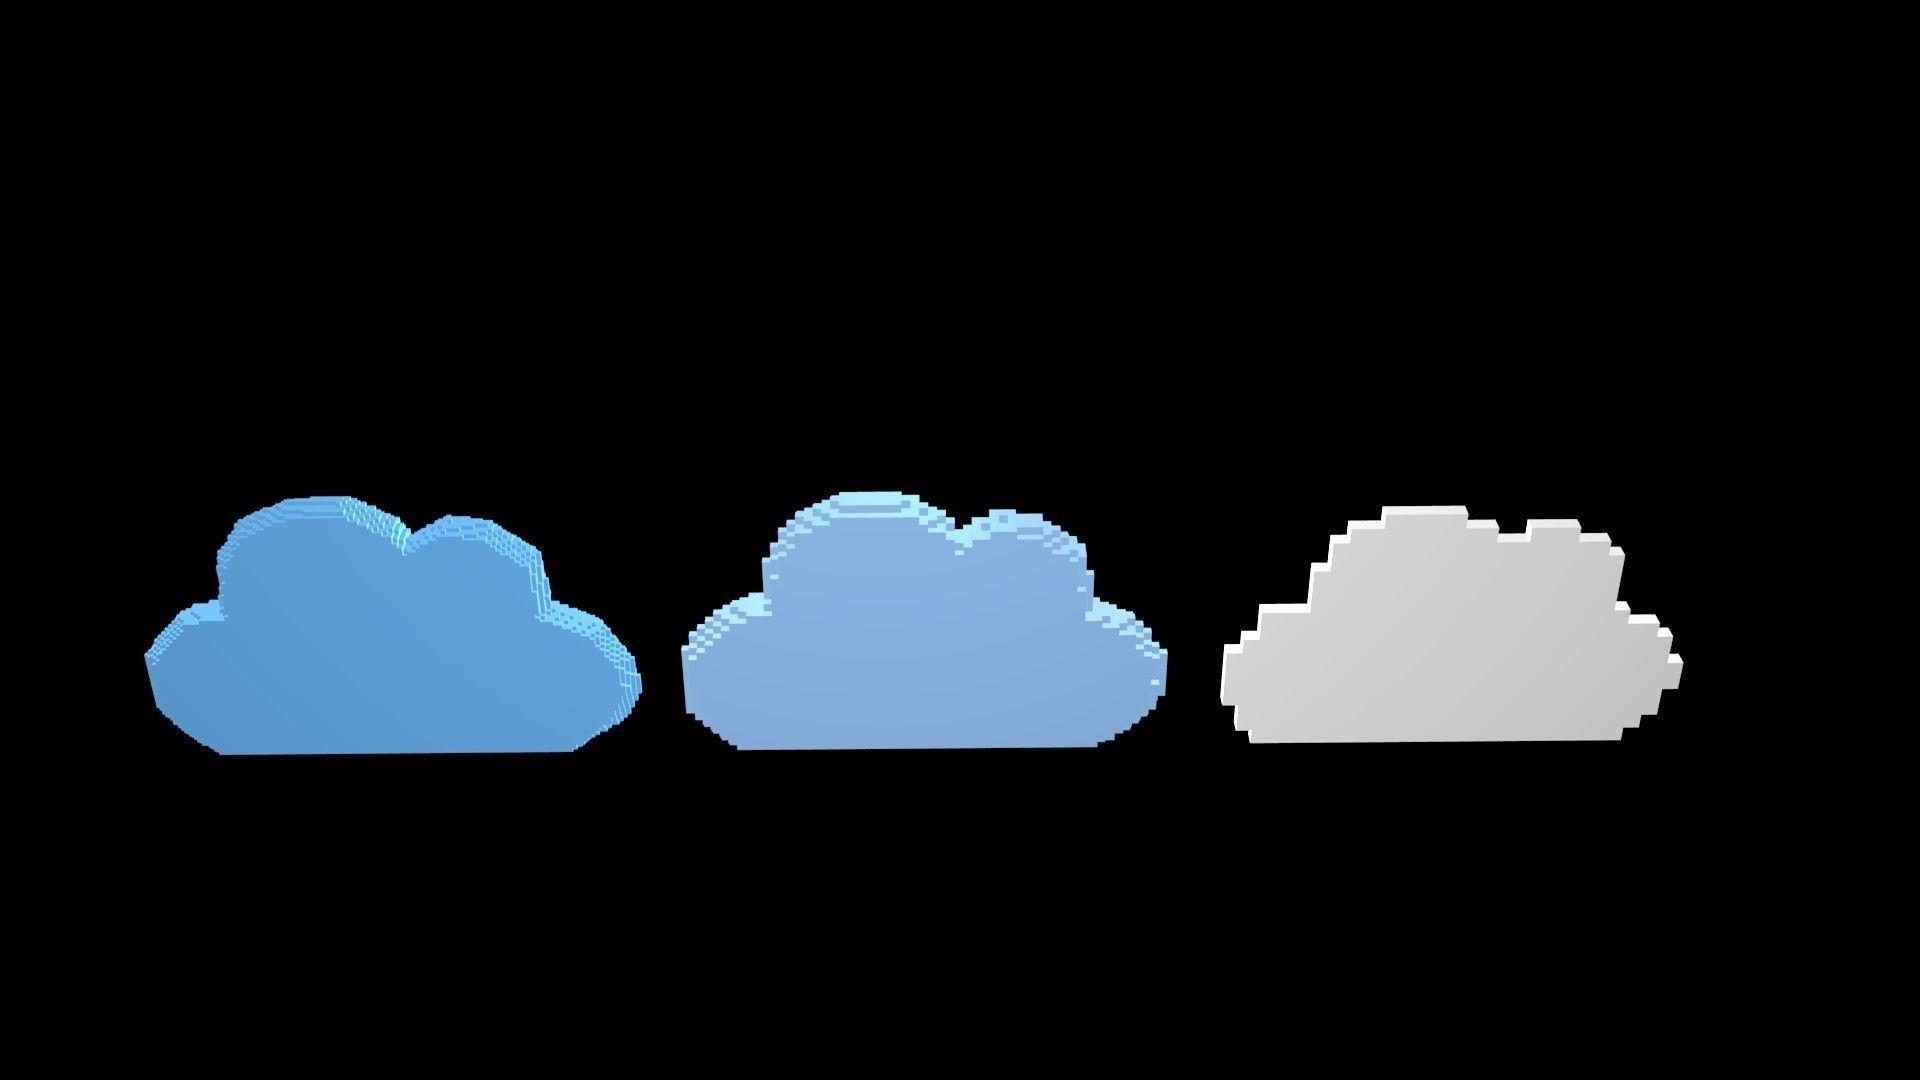 Cloud symbols voxel